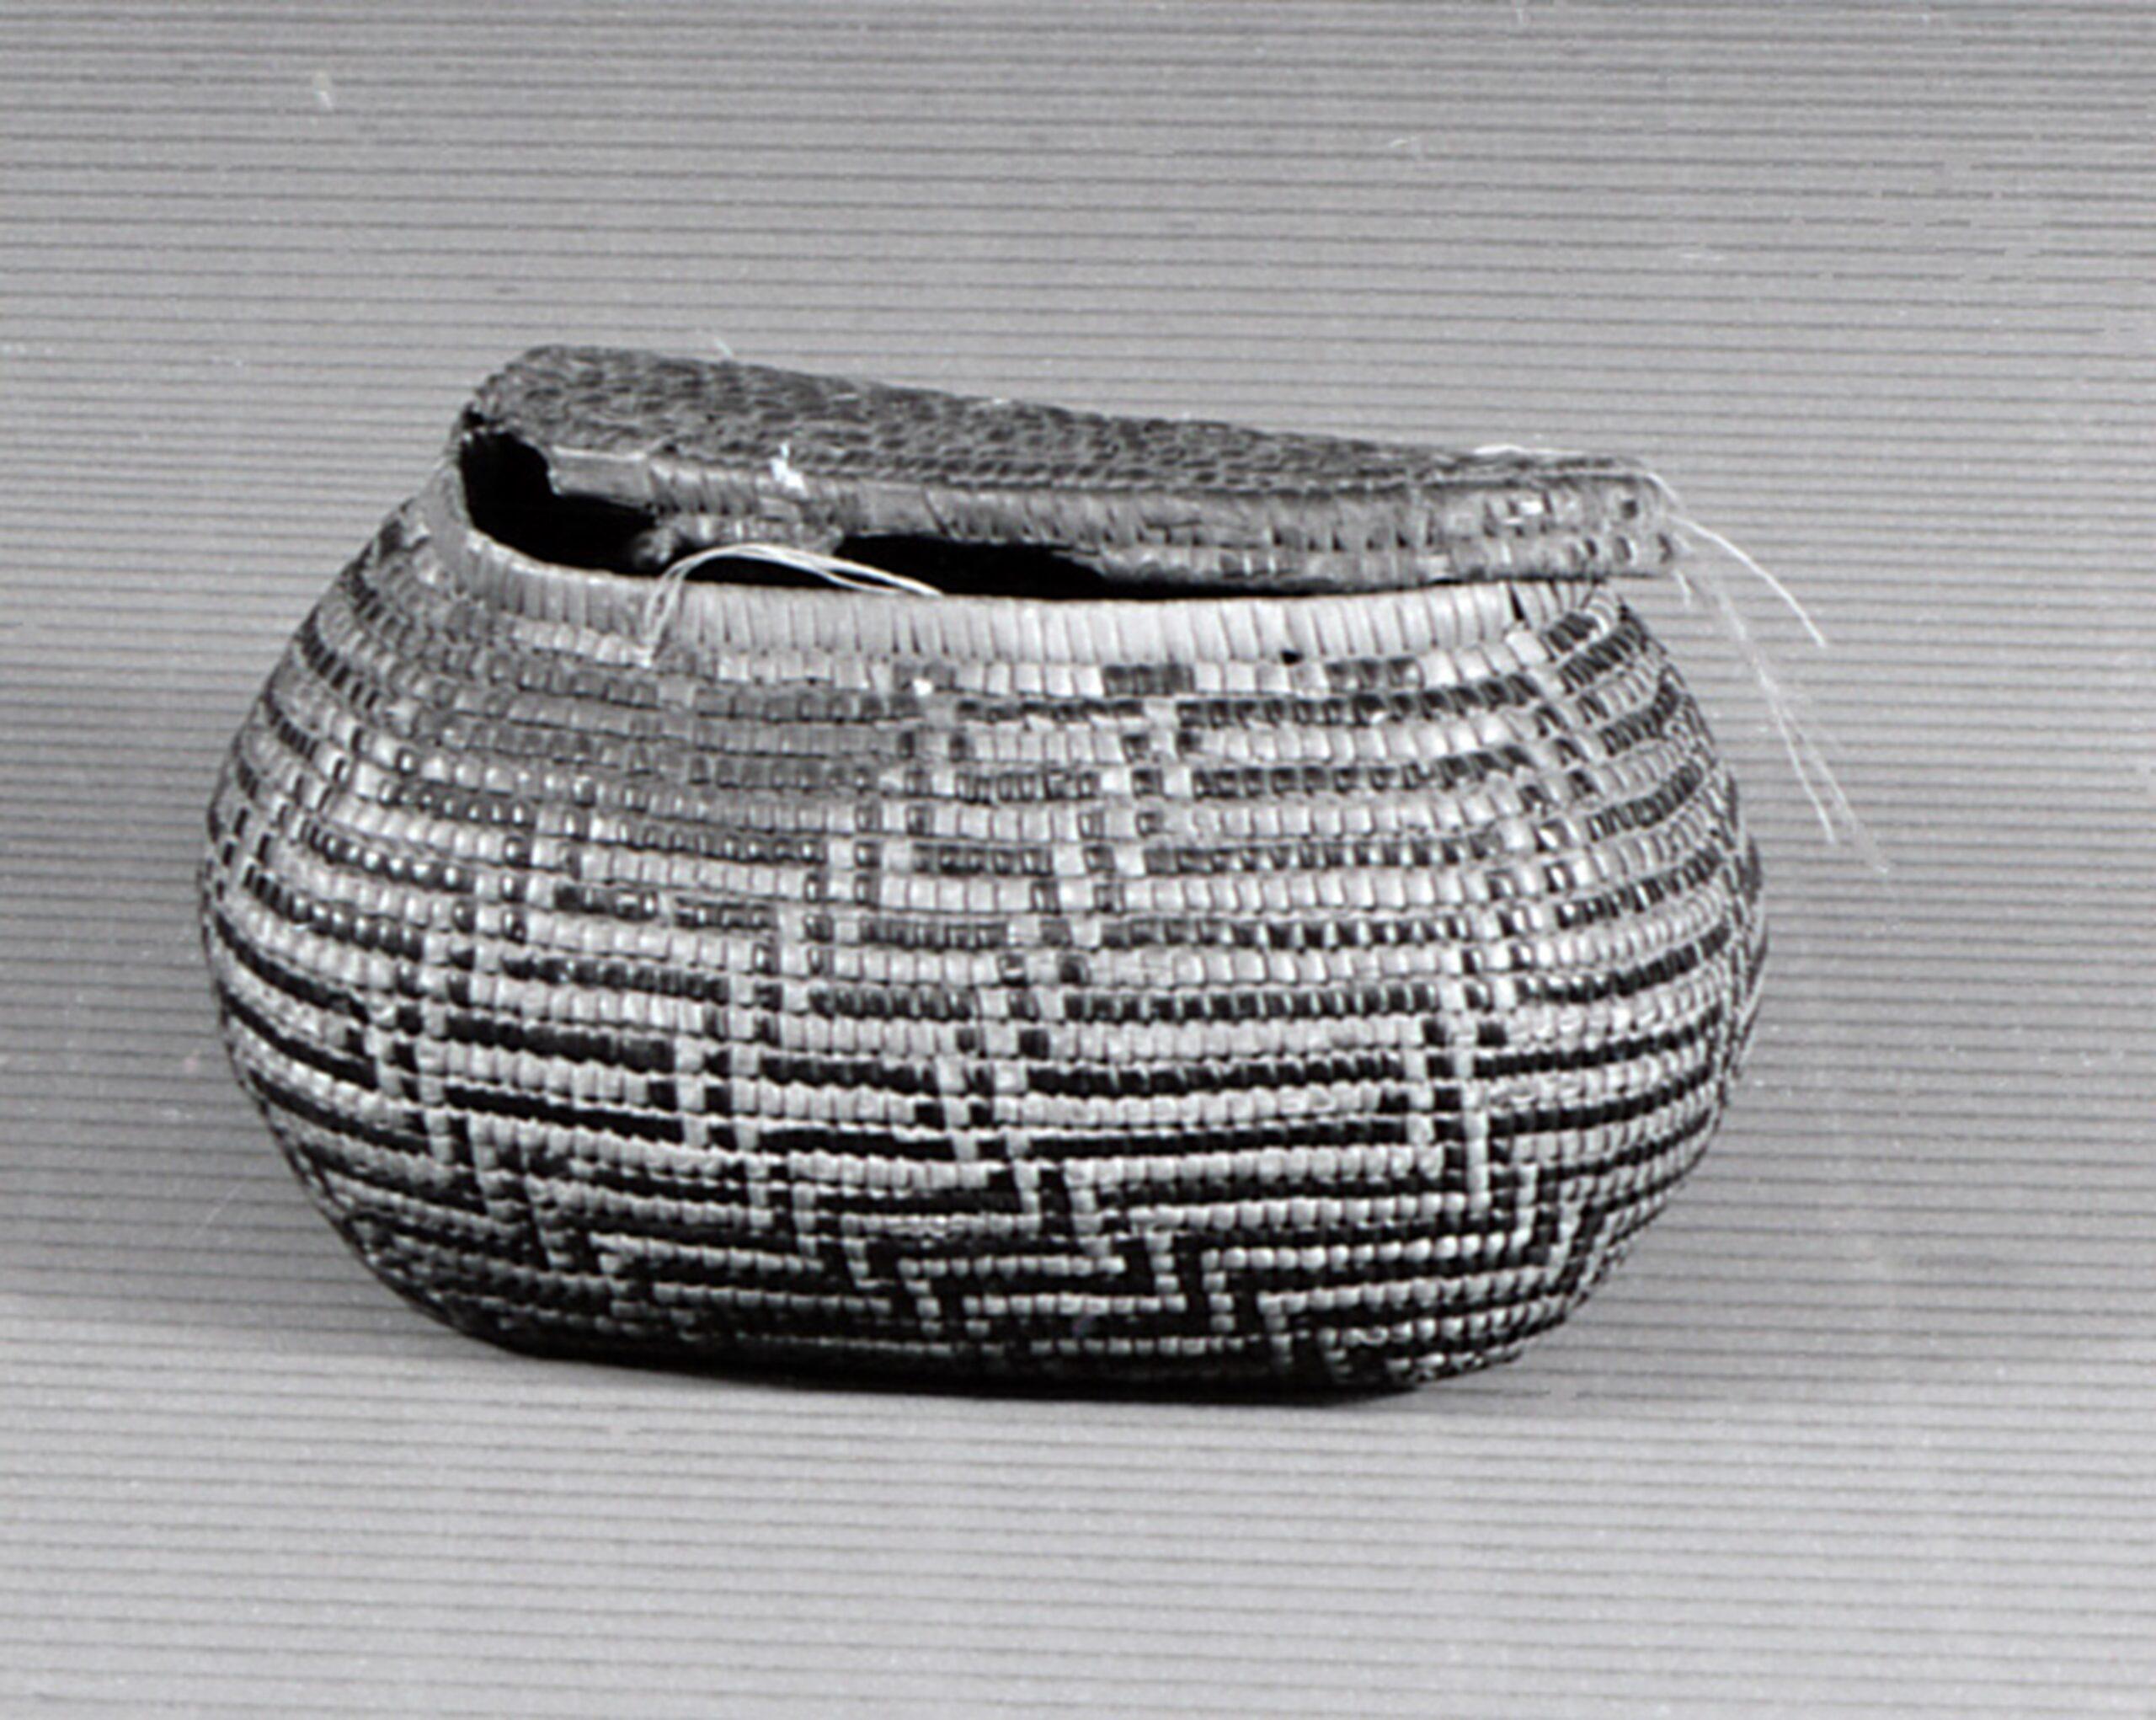 Chehalis (Cowlitz) artifact.